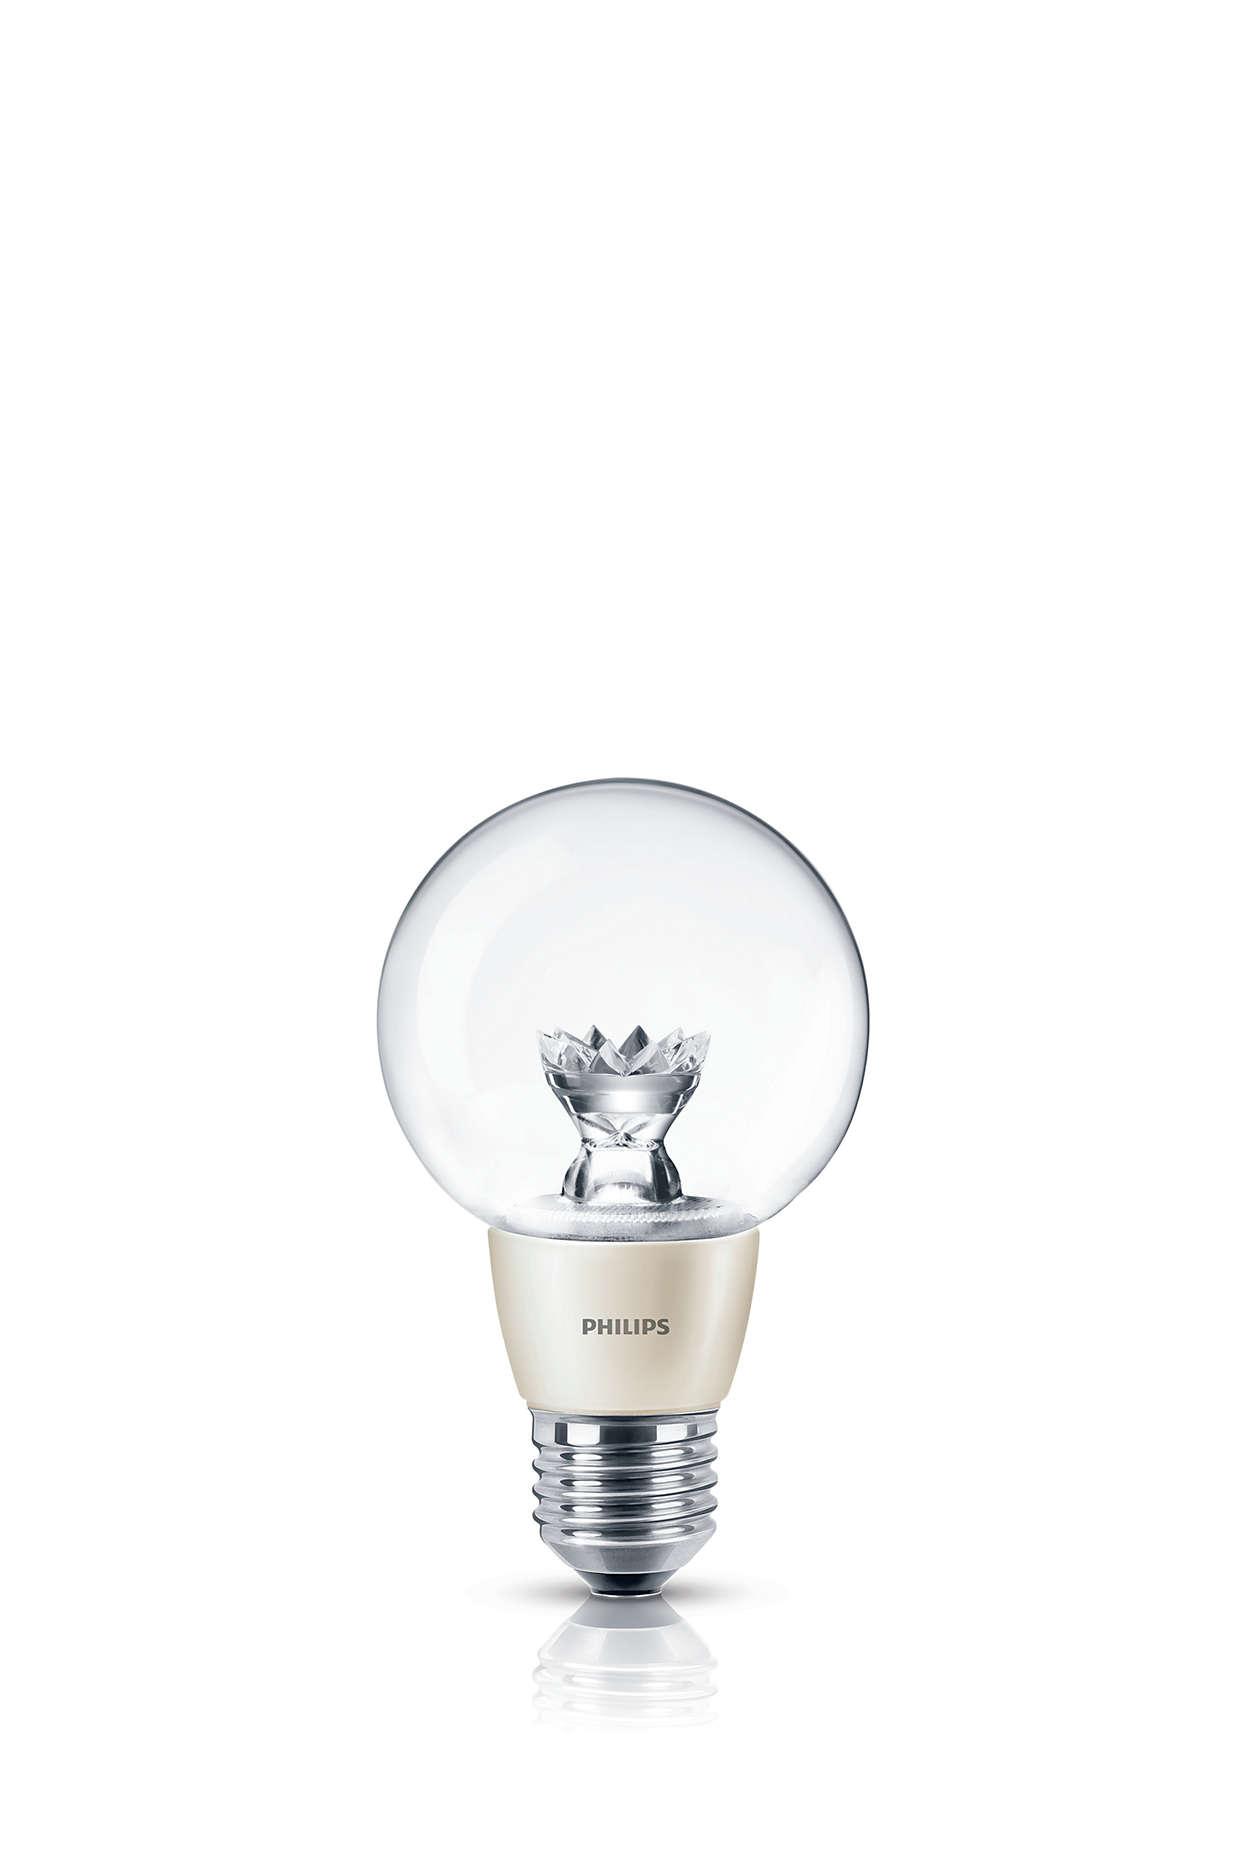 Decorative accent light with a brilliant sparkle